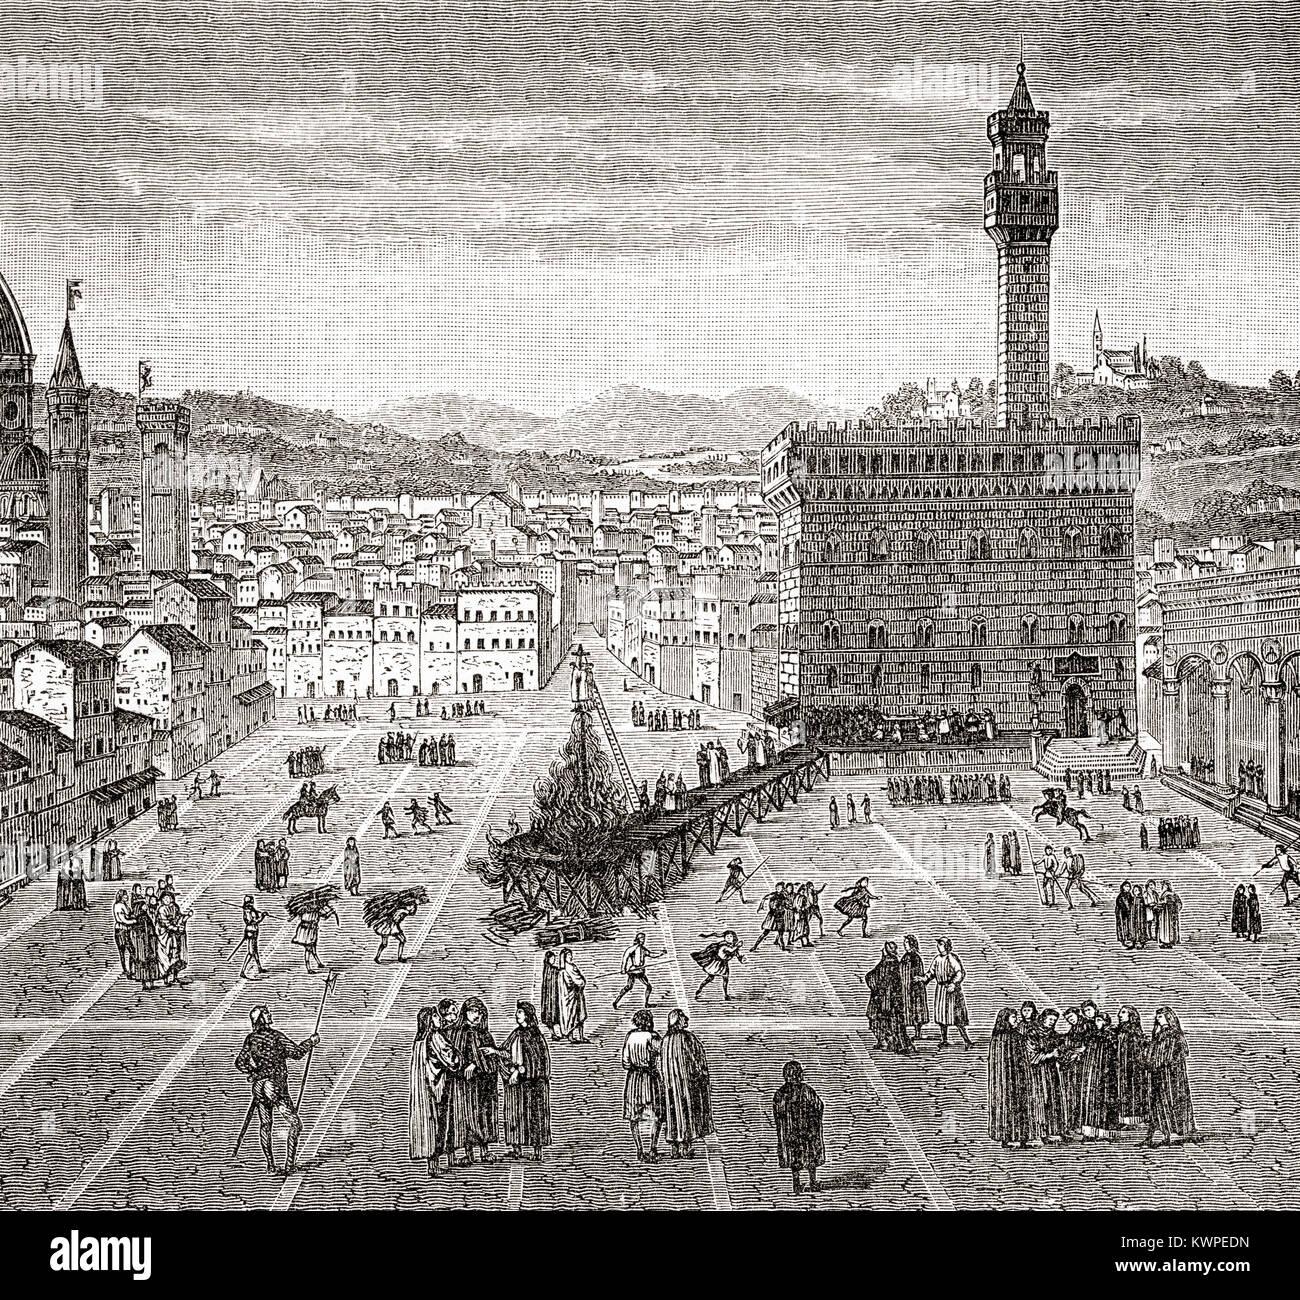 L'exécution de Girolamo Savonarola, Piazza della Signoria, l'Italie. Girolamo Savonarola aka Jérôme Photo Stock